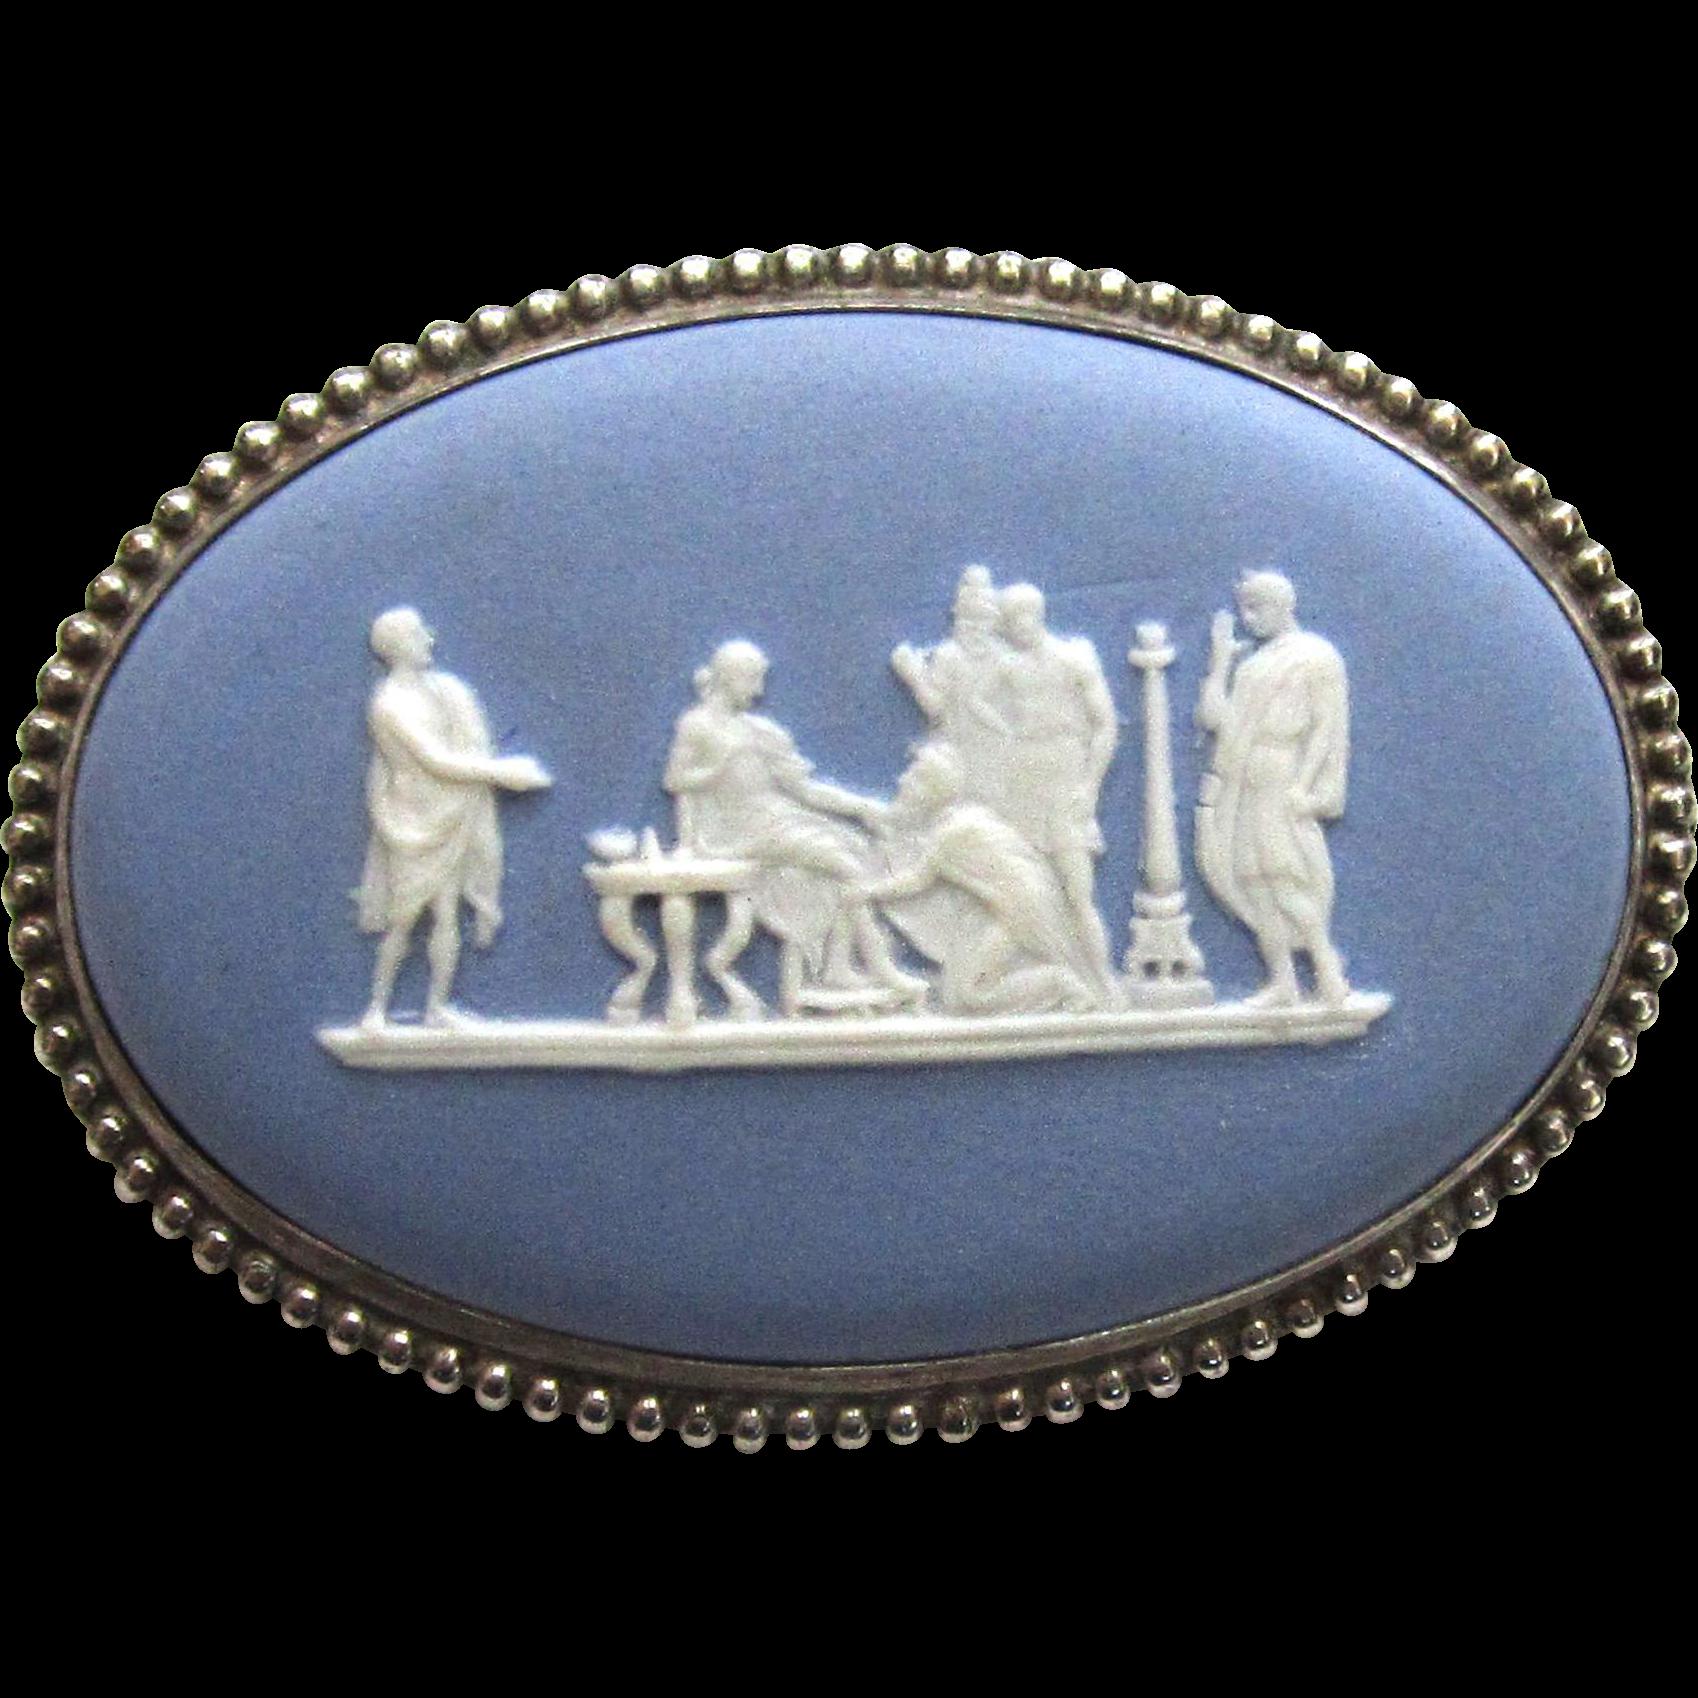 Wedgwood Jasperware Greek Mythological Cameo Brooch/Pin